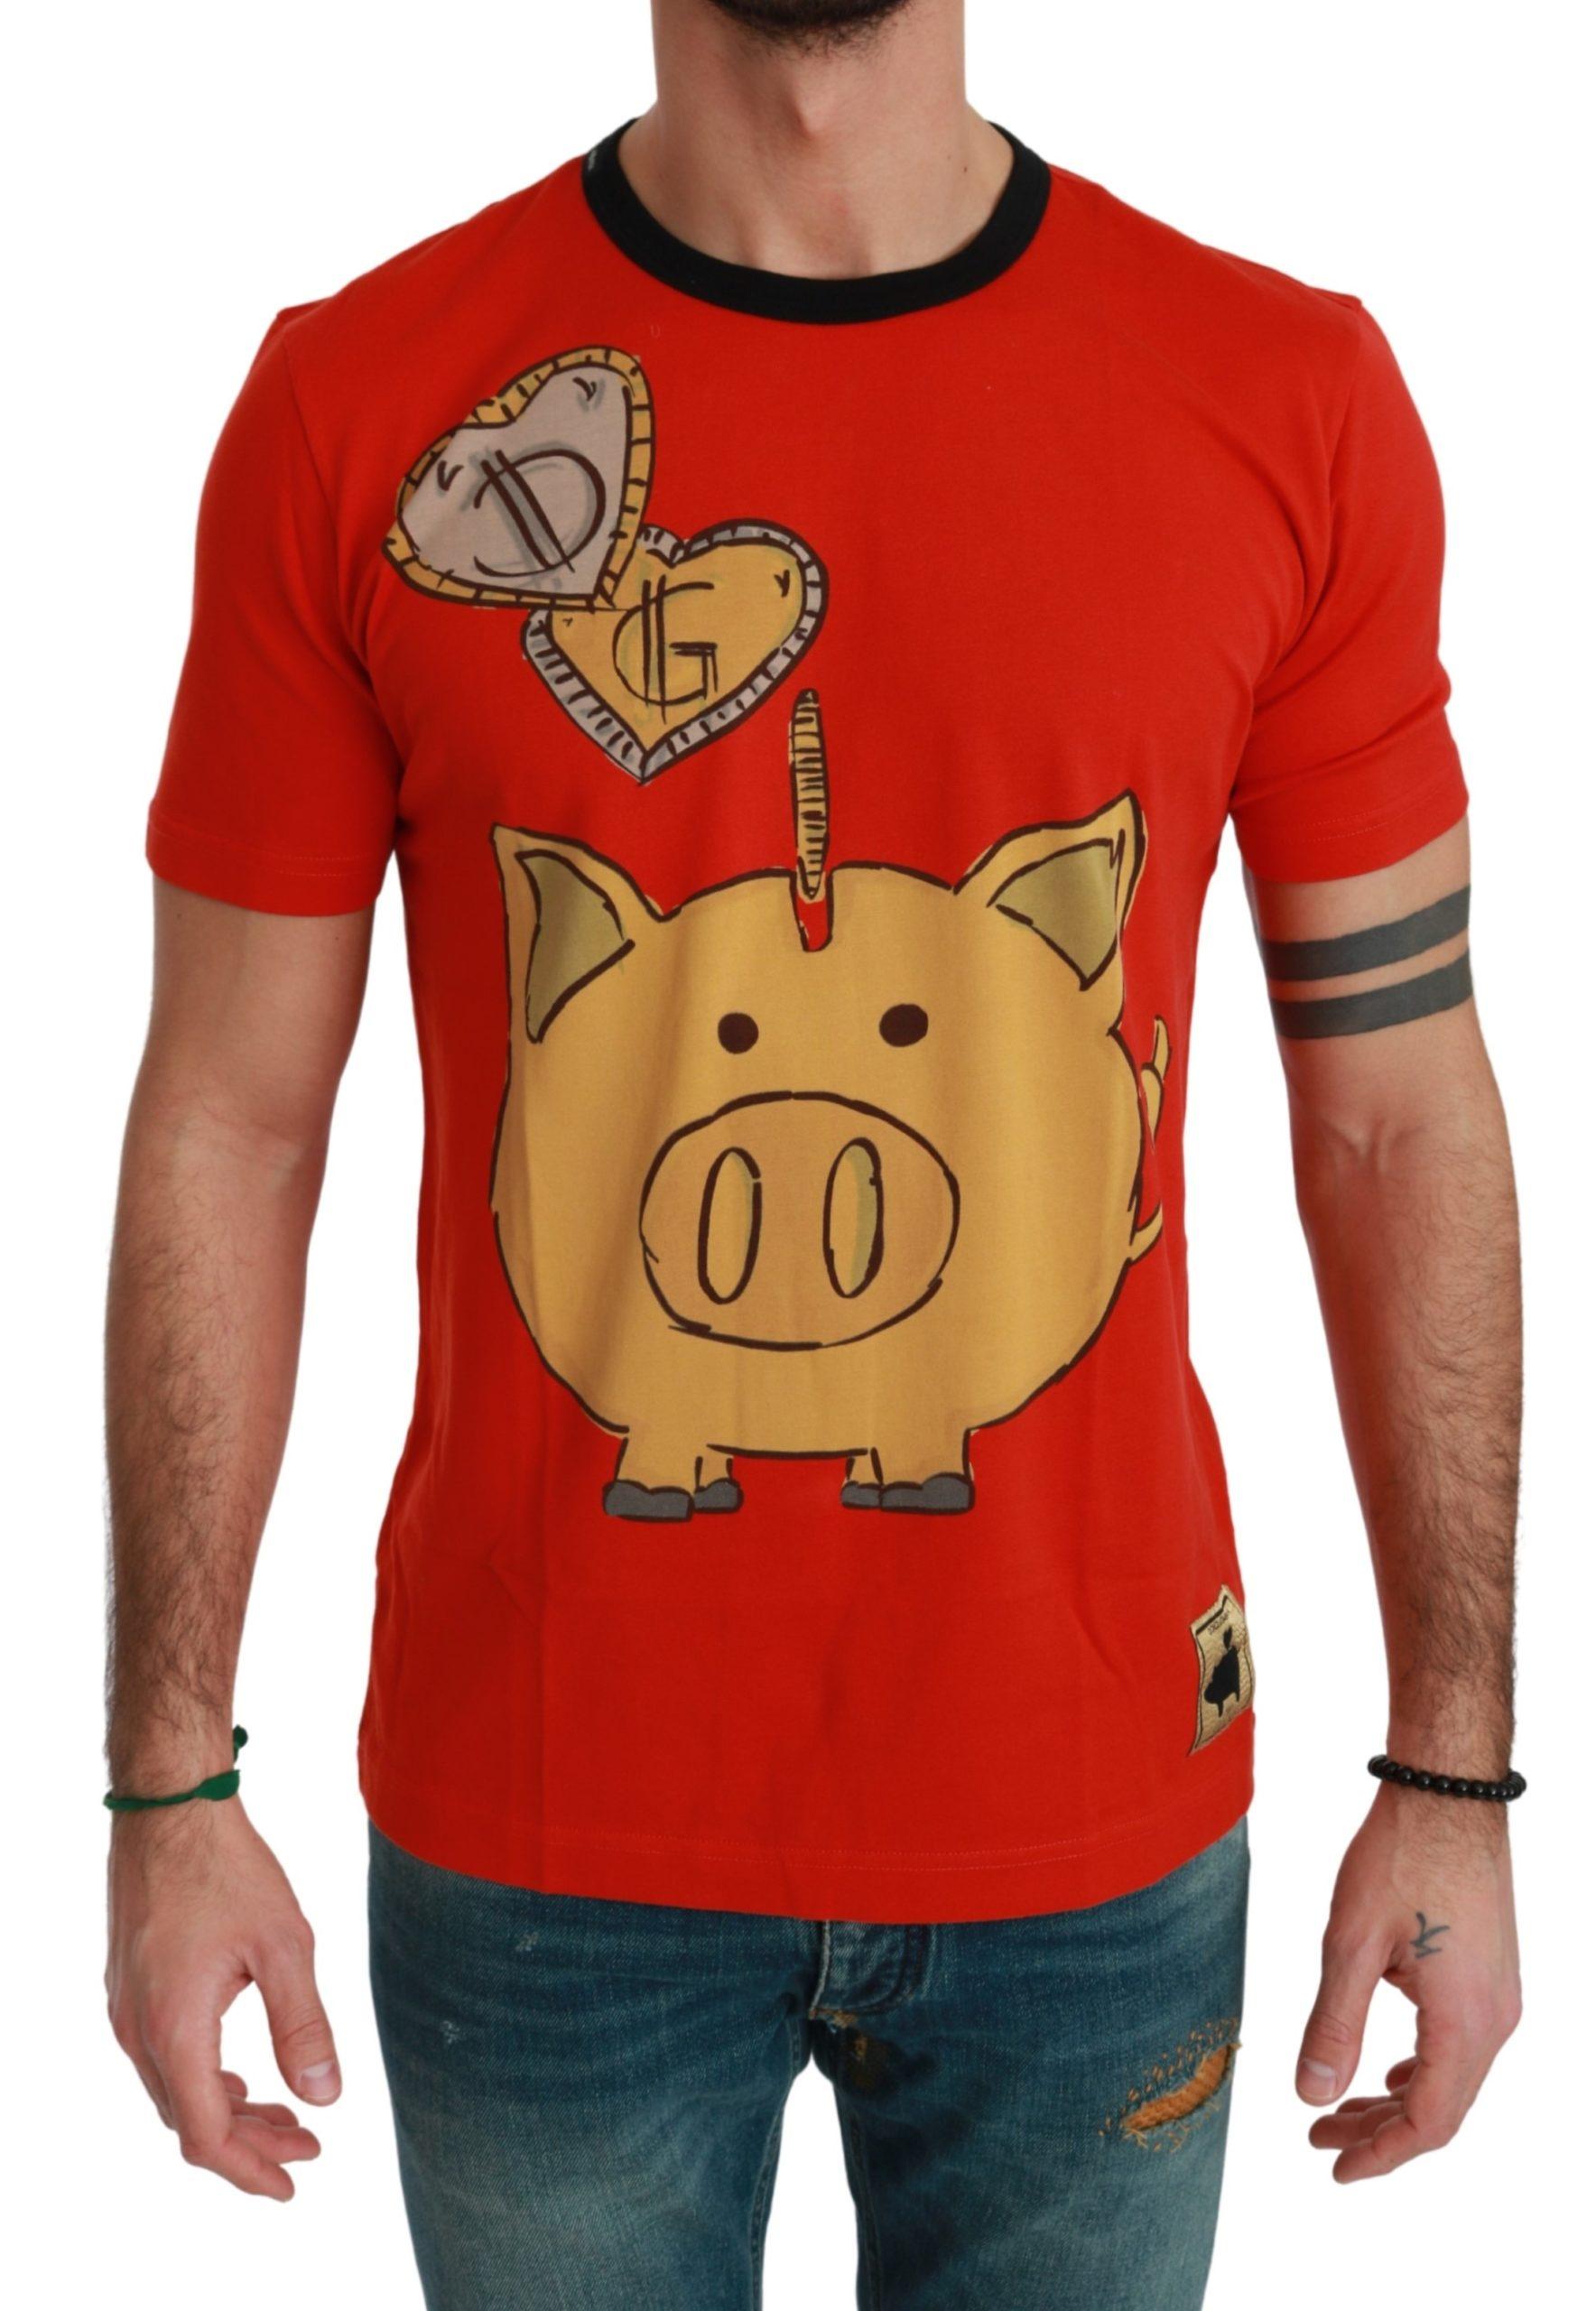 Dolce & Gabbana Men's Cotton Money Pig T-Shirt Red TSH4565 - IT56 | XXL